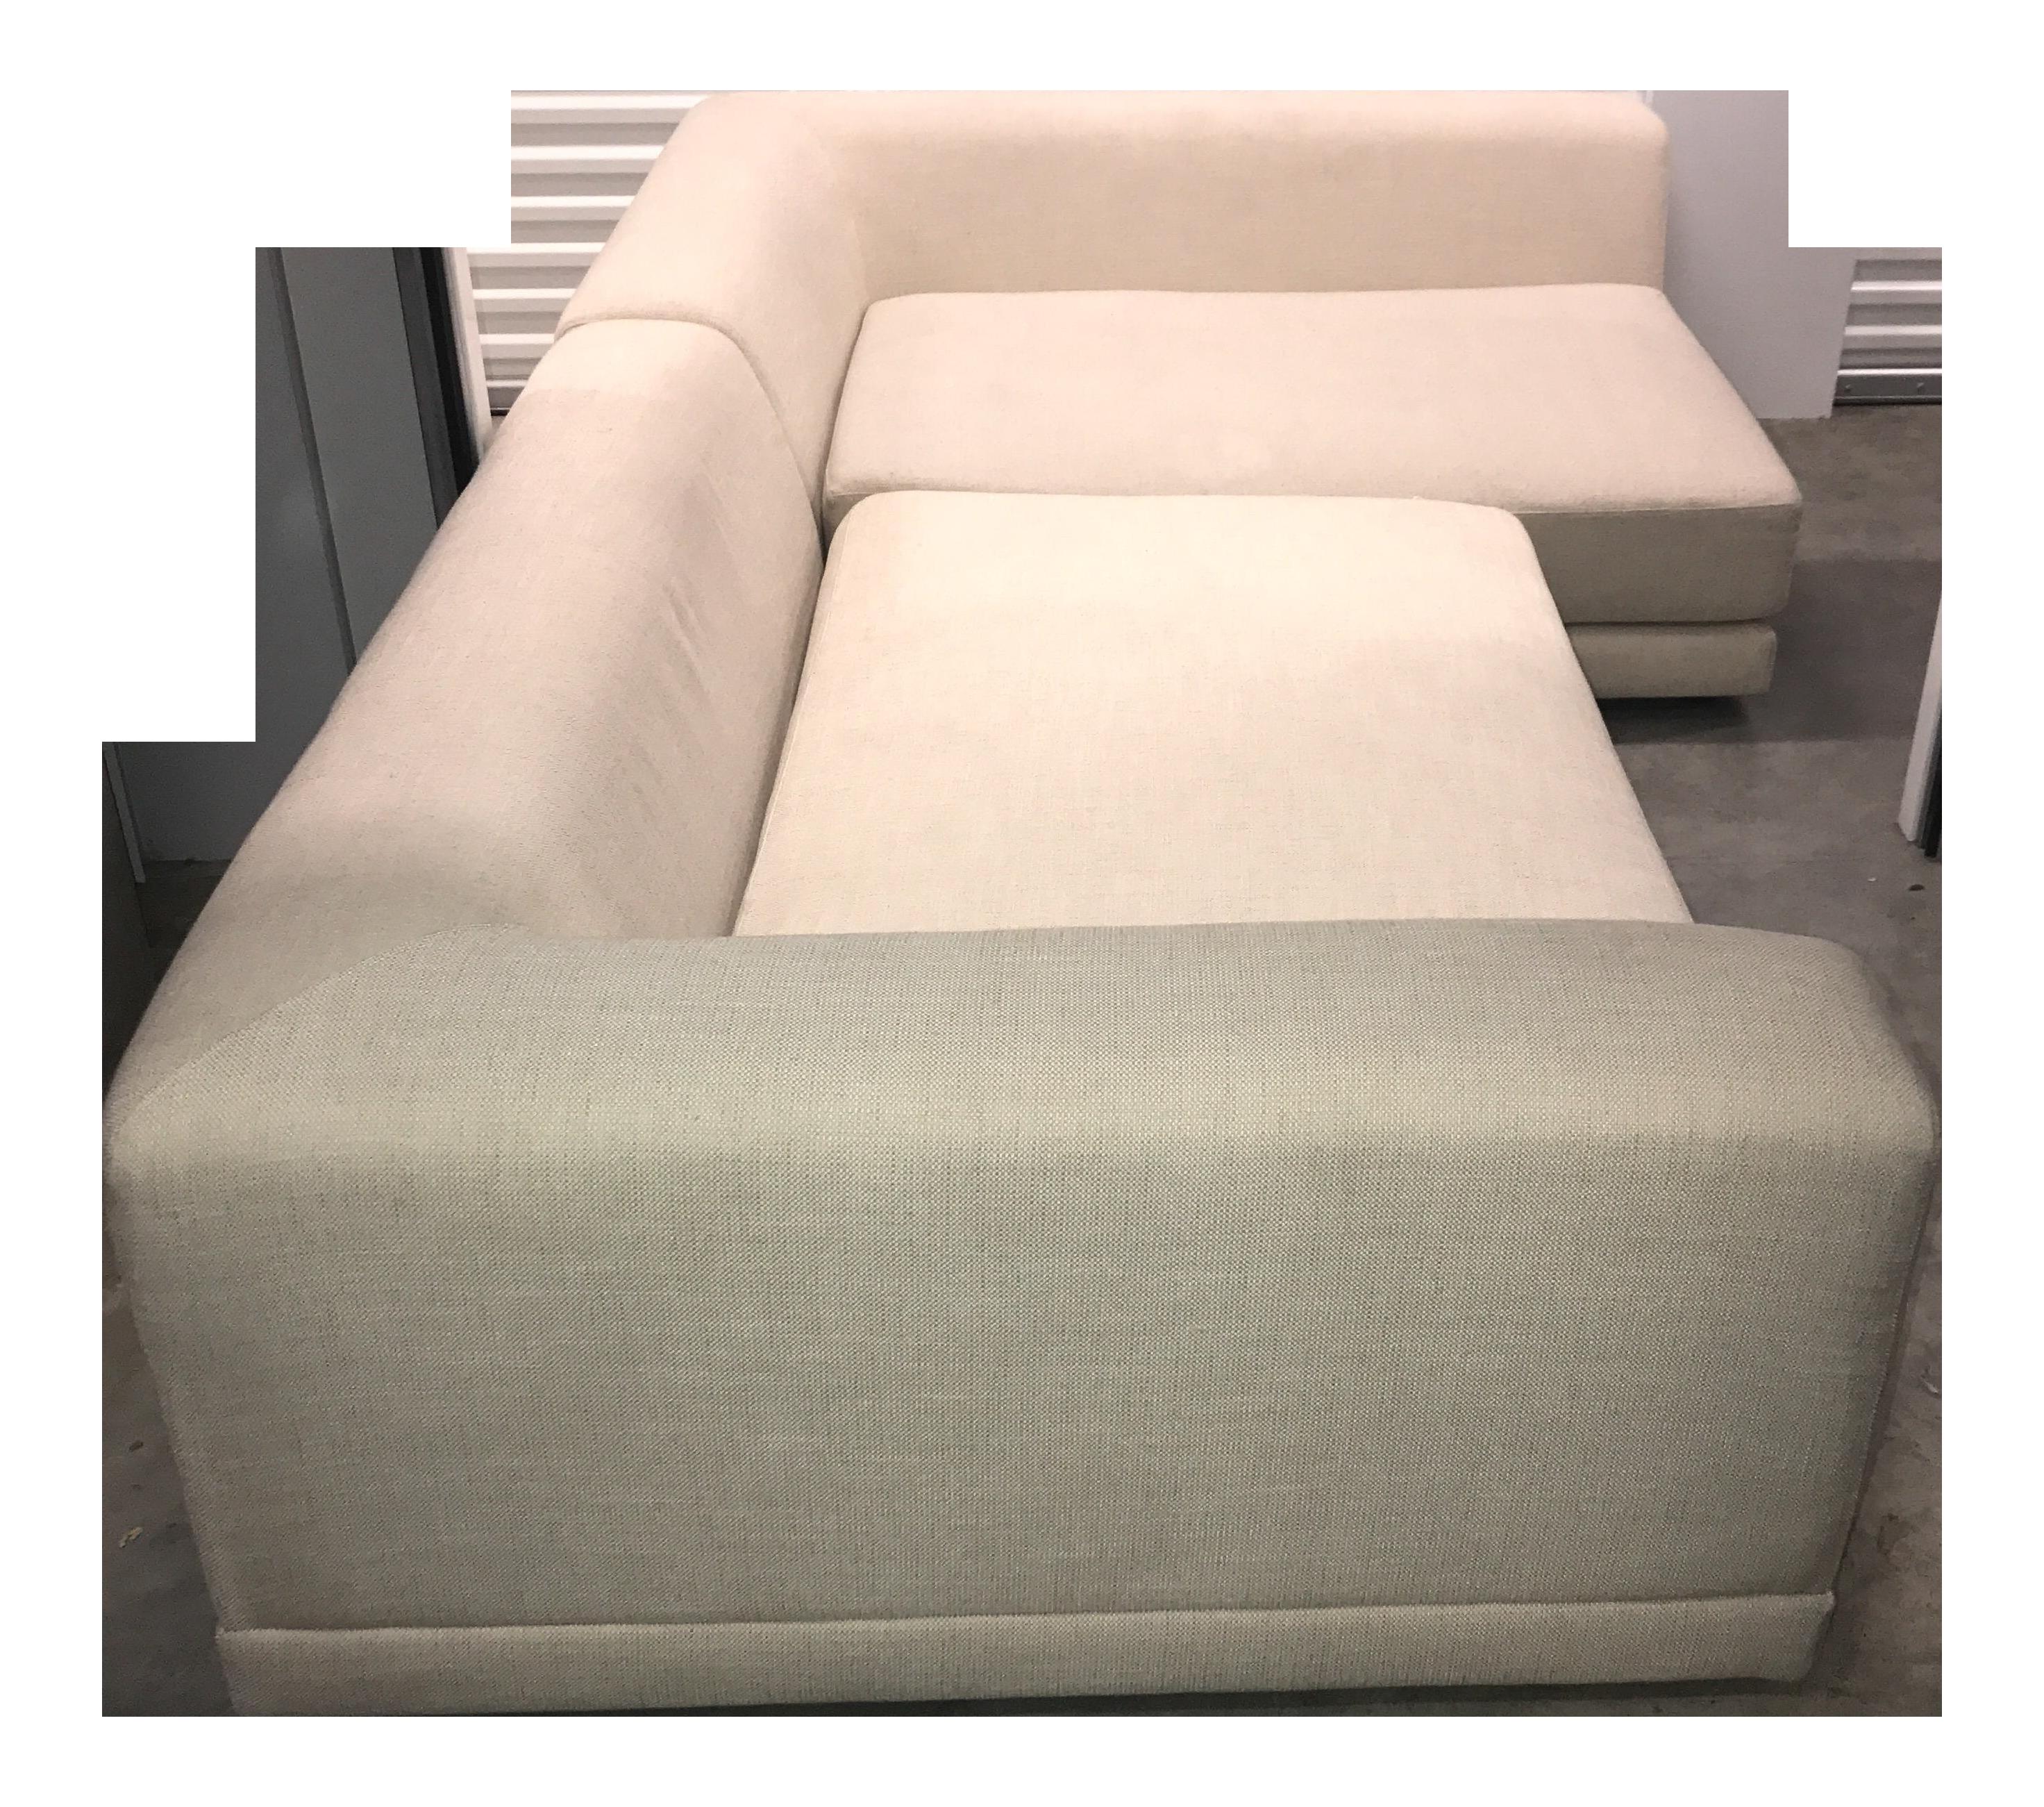 CB2 Uno Sectional Sofa